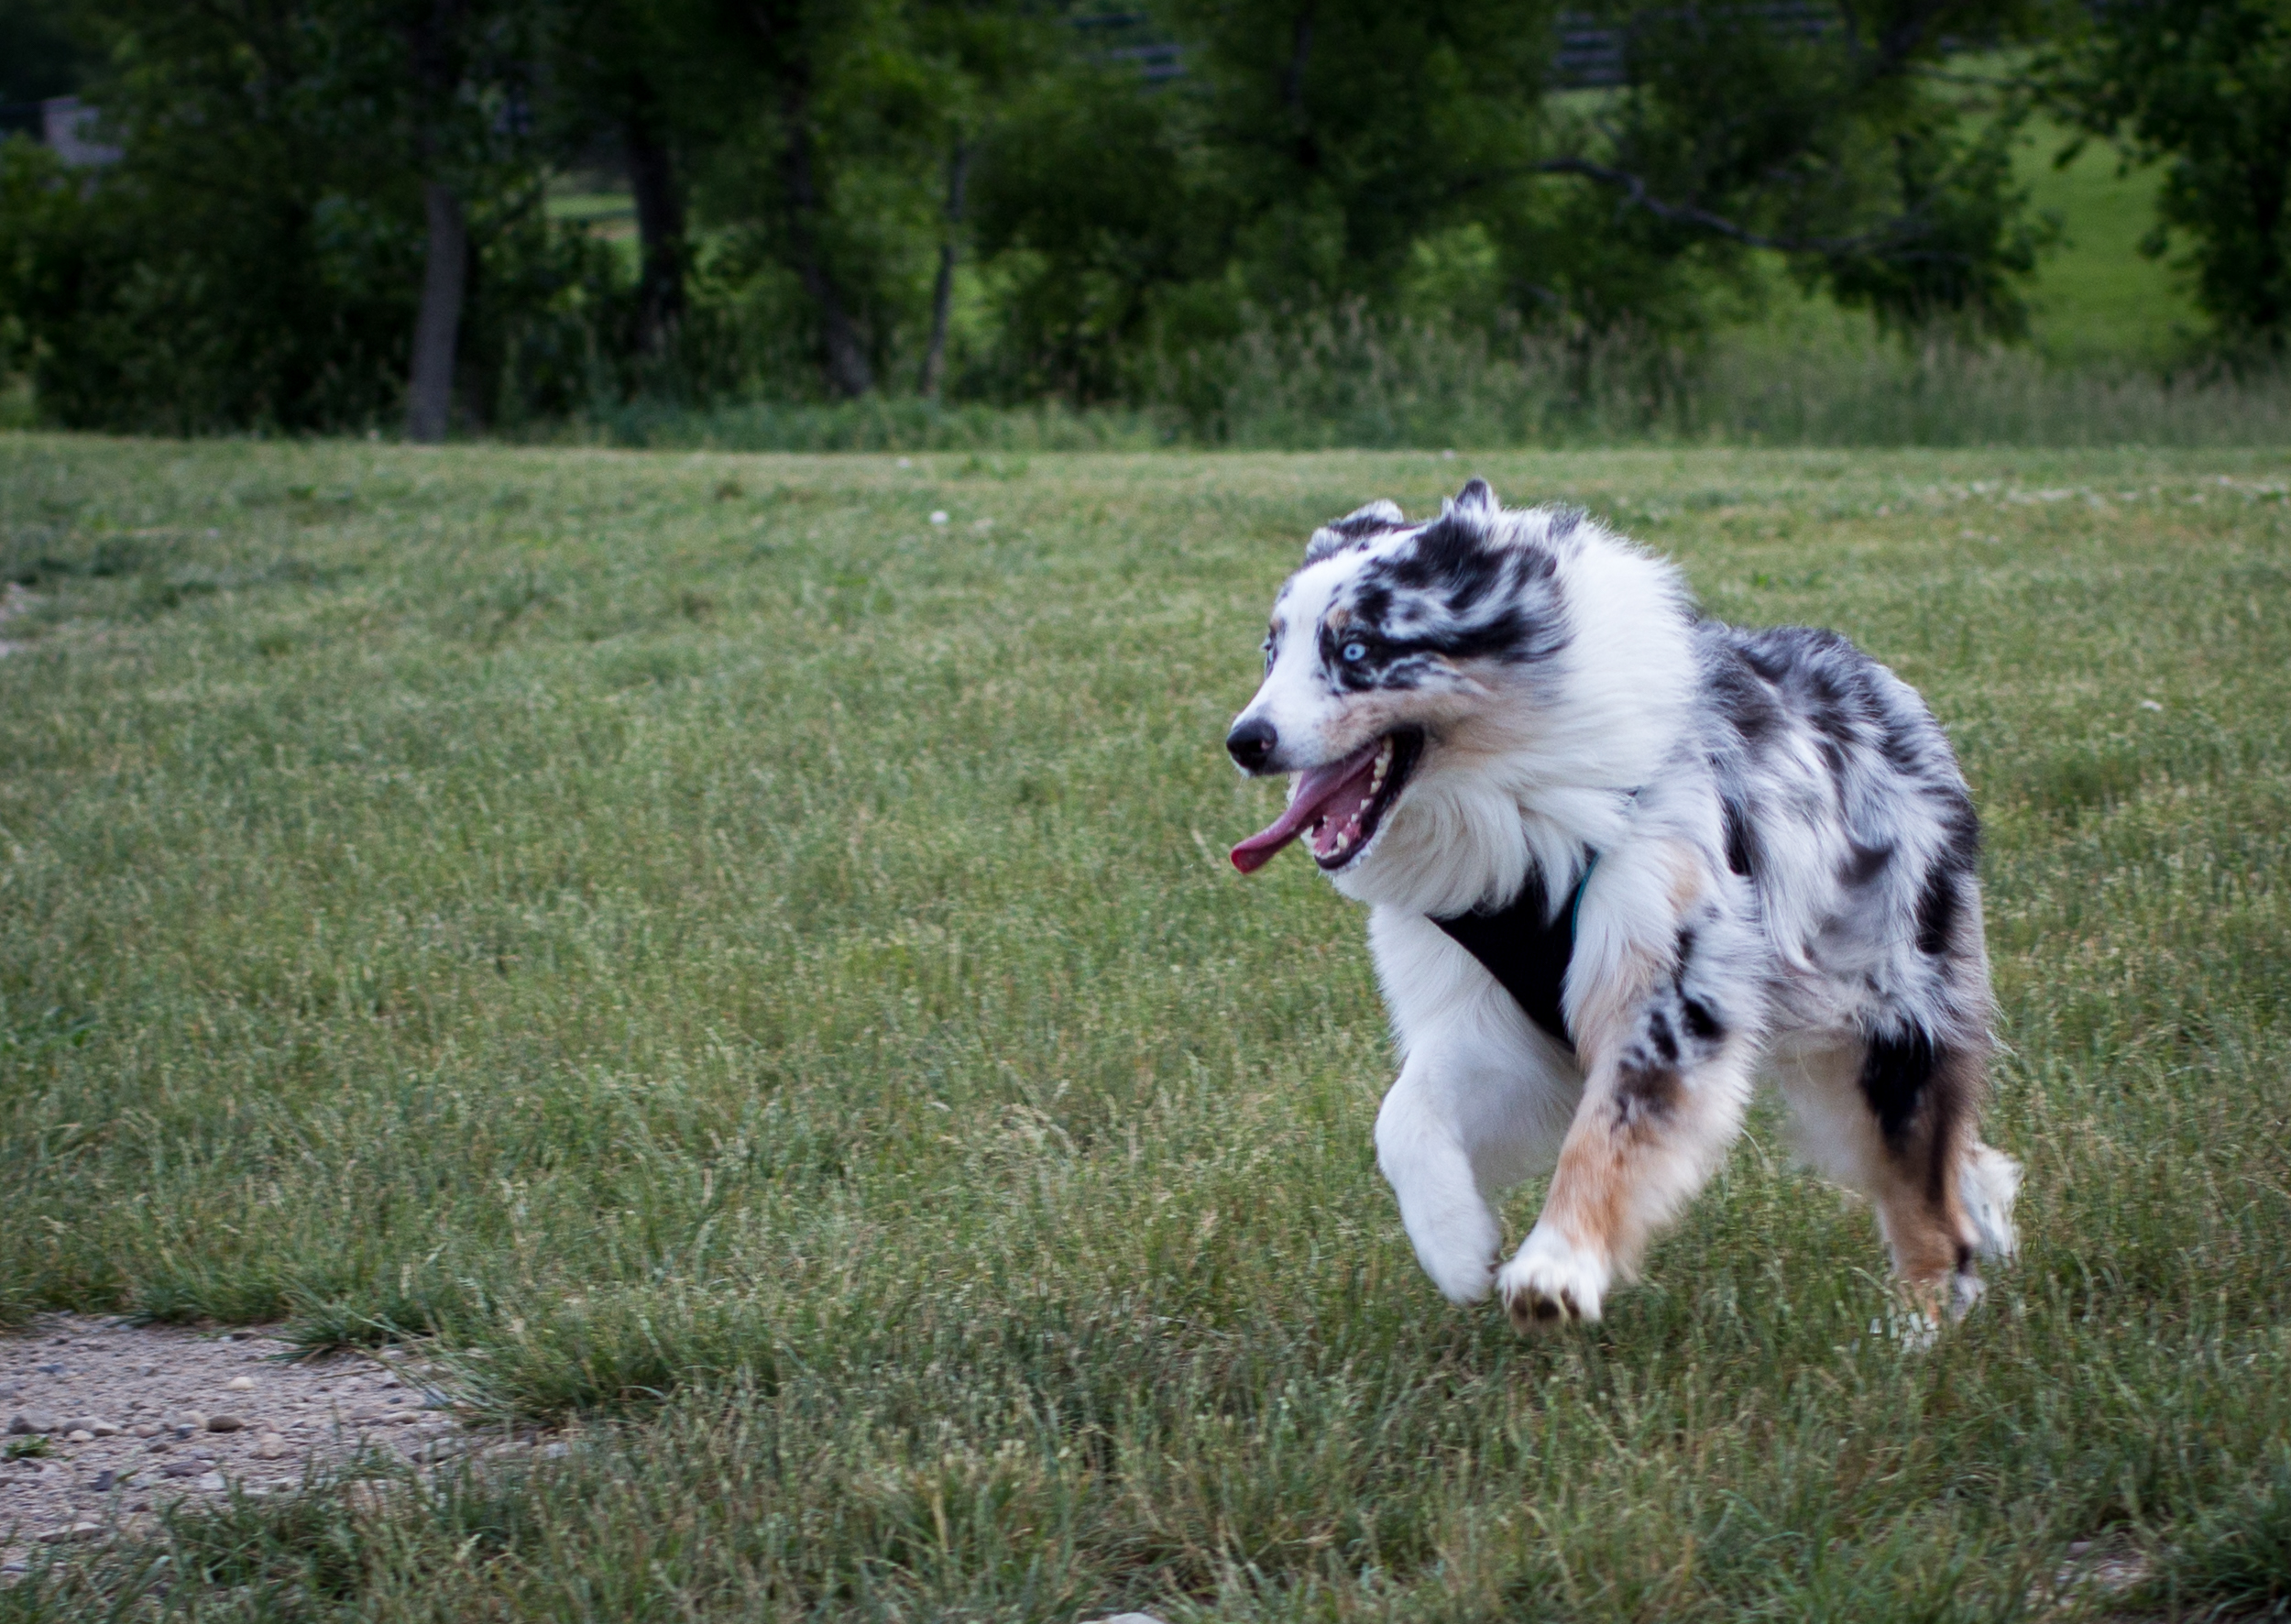 Lacey_dogpark_061817-1.jpg